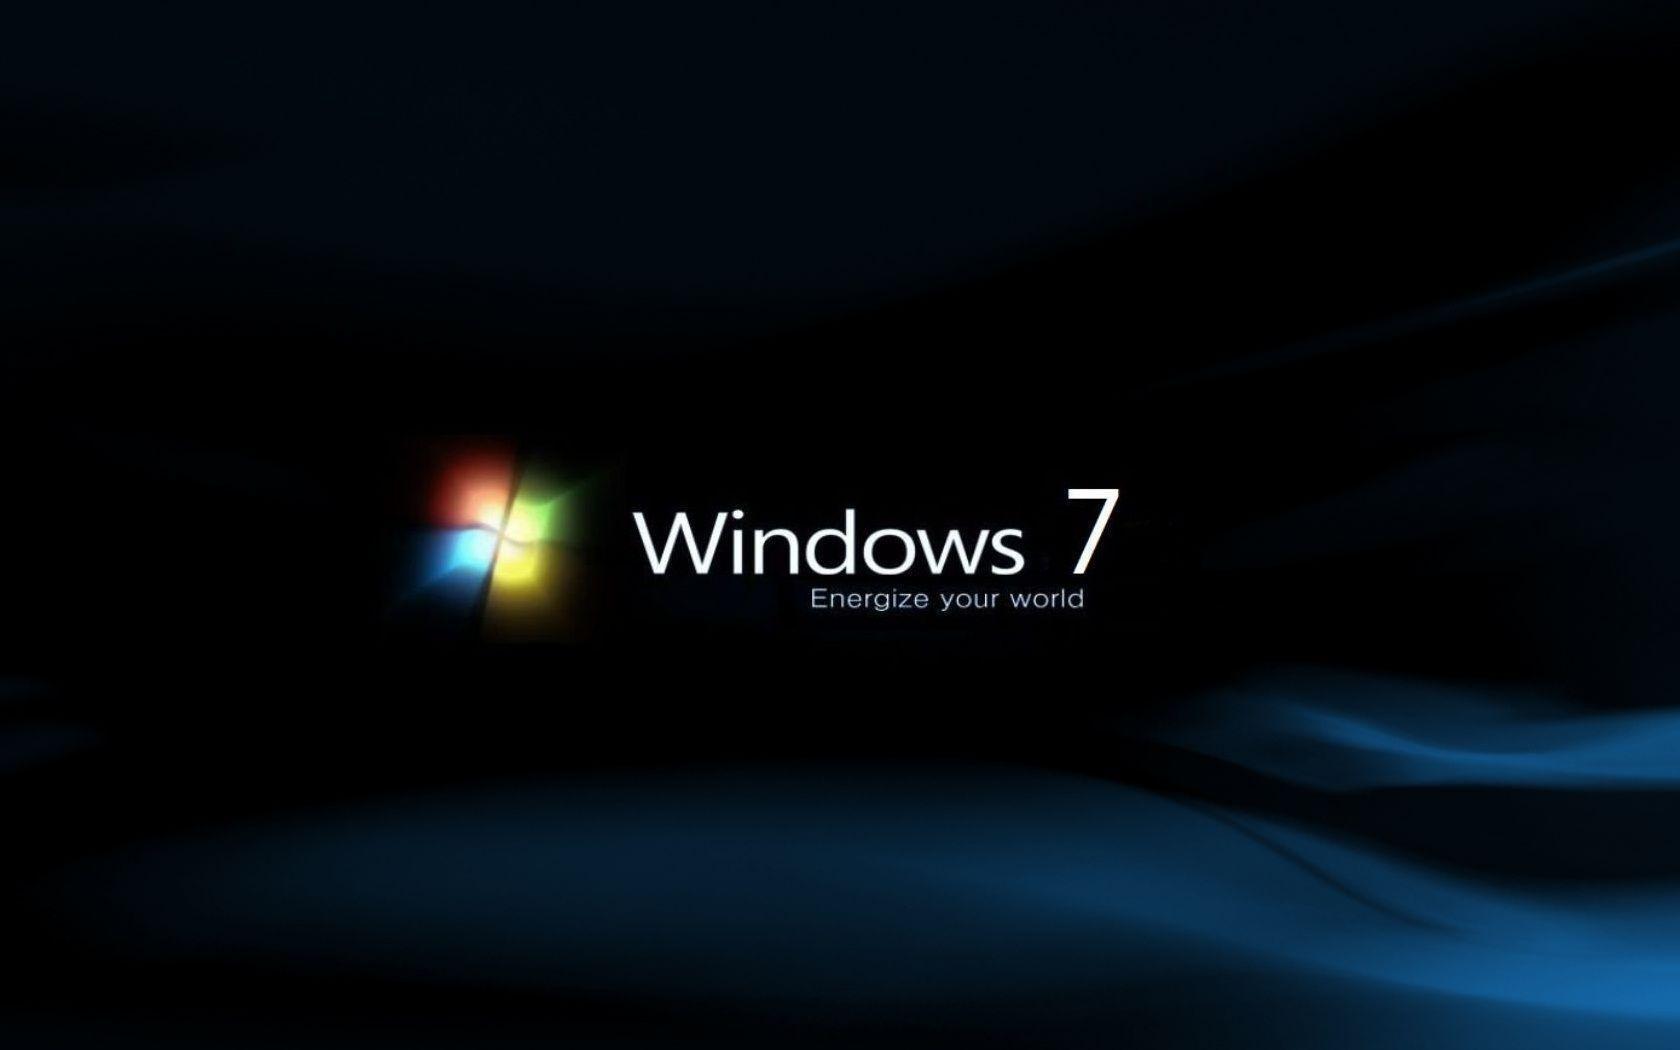 download widescreen windows 7 - photo #28